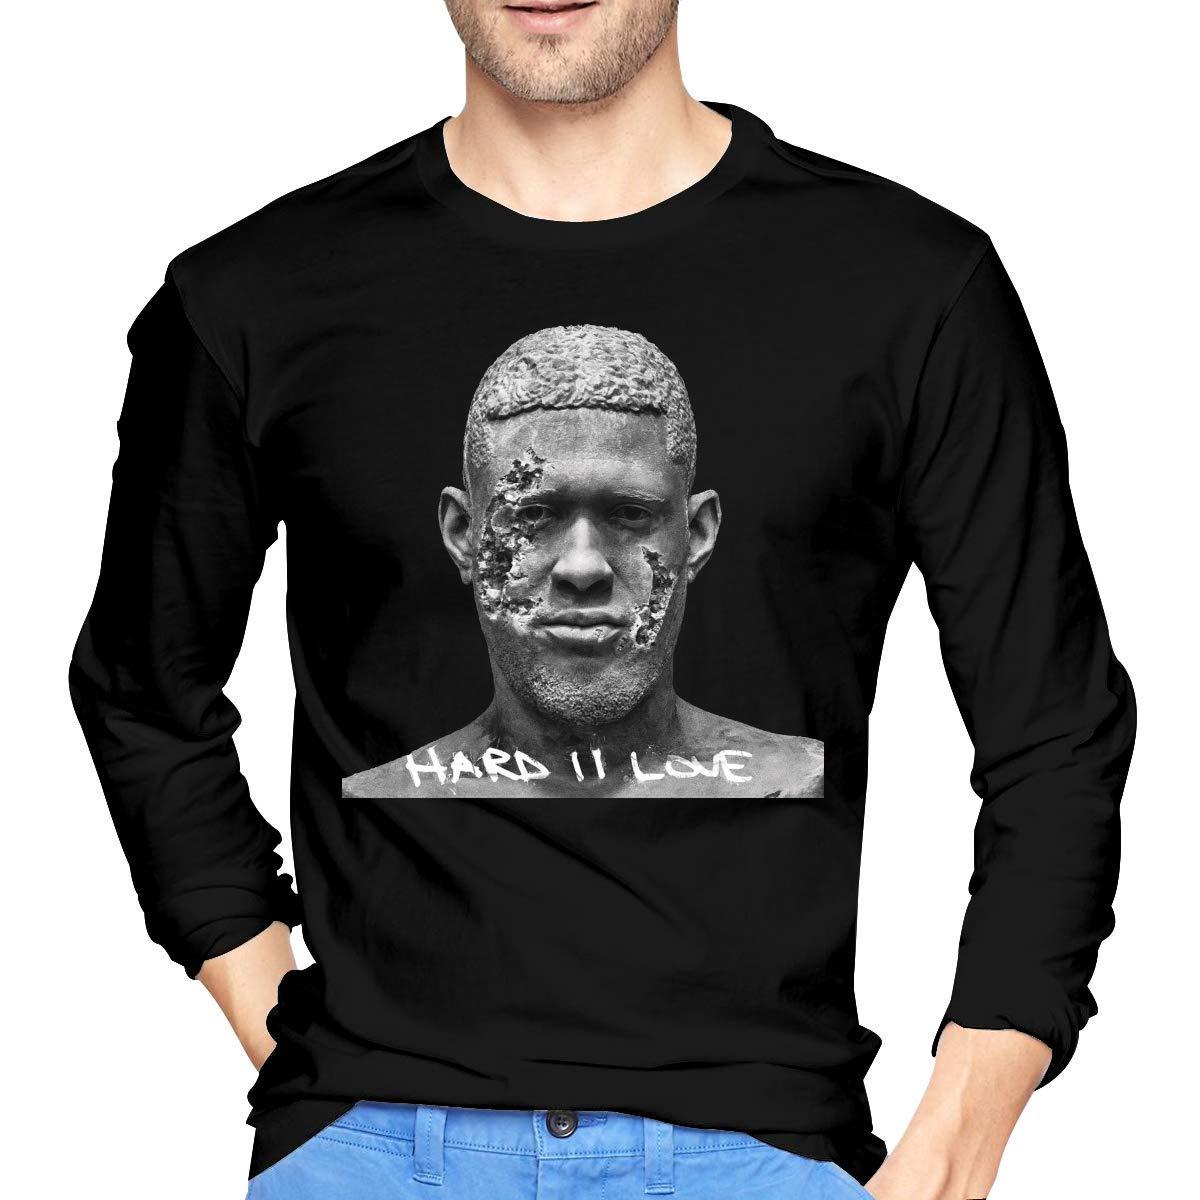 Fssatung S Usher Hard Ii Love T Shirt Black